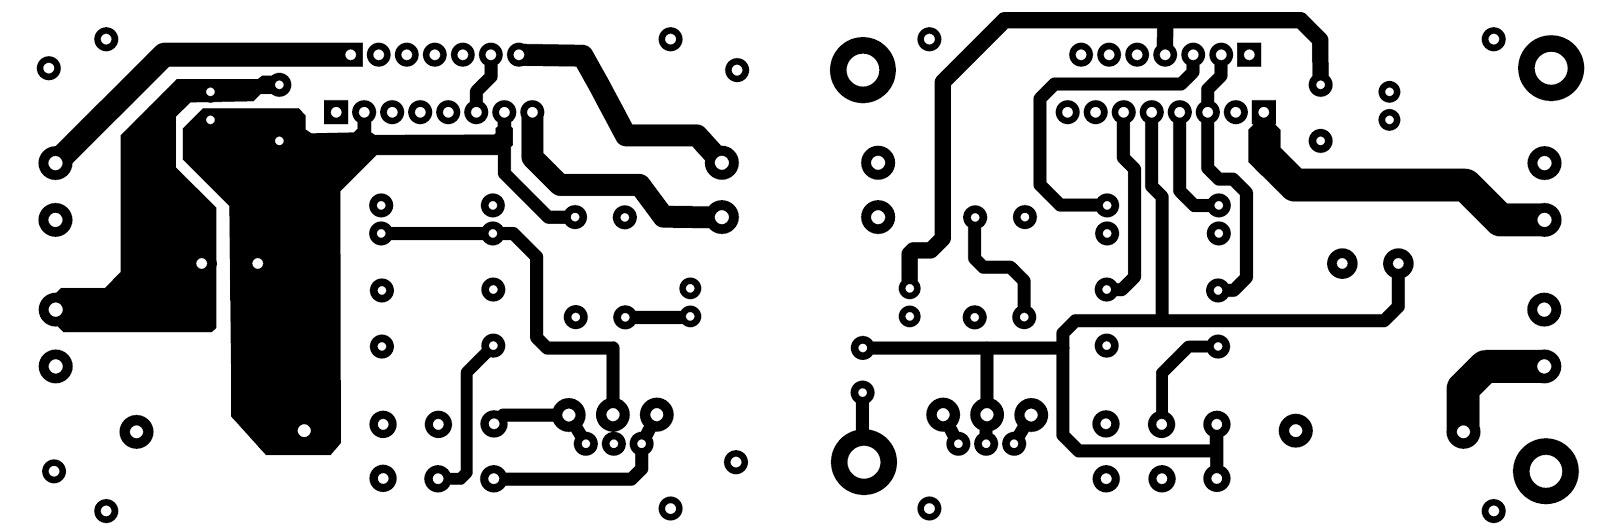 Tda7377 Amplifier Circuit 12v Stereo 30w Quad Op Amp Diagram Amplifiercircuit Connection Pcb